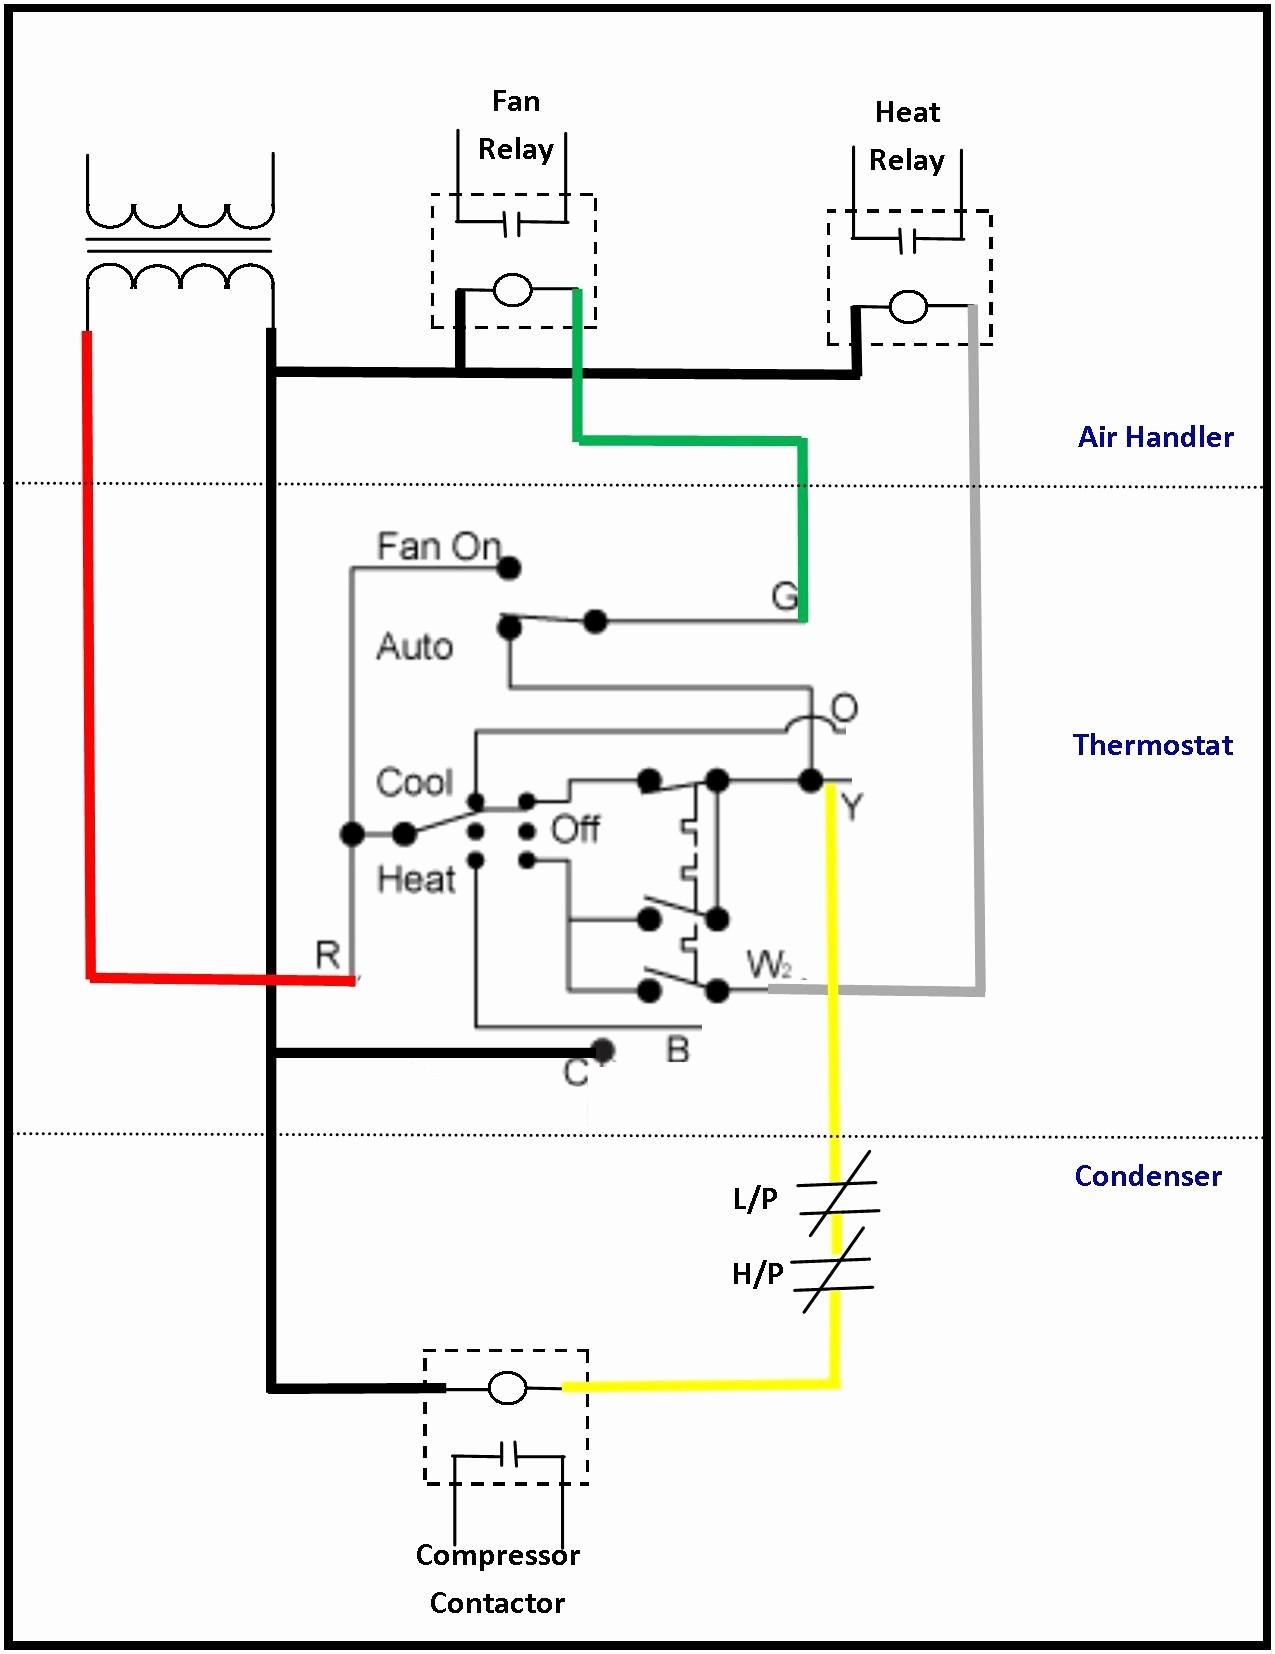 Rheem Heat Pump Contactor Wiring Diagram | Wiring Diagram - Rheem Heat Pump Wiring Diagram